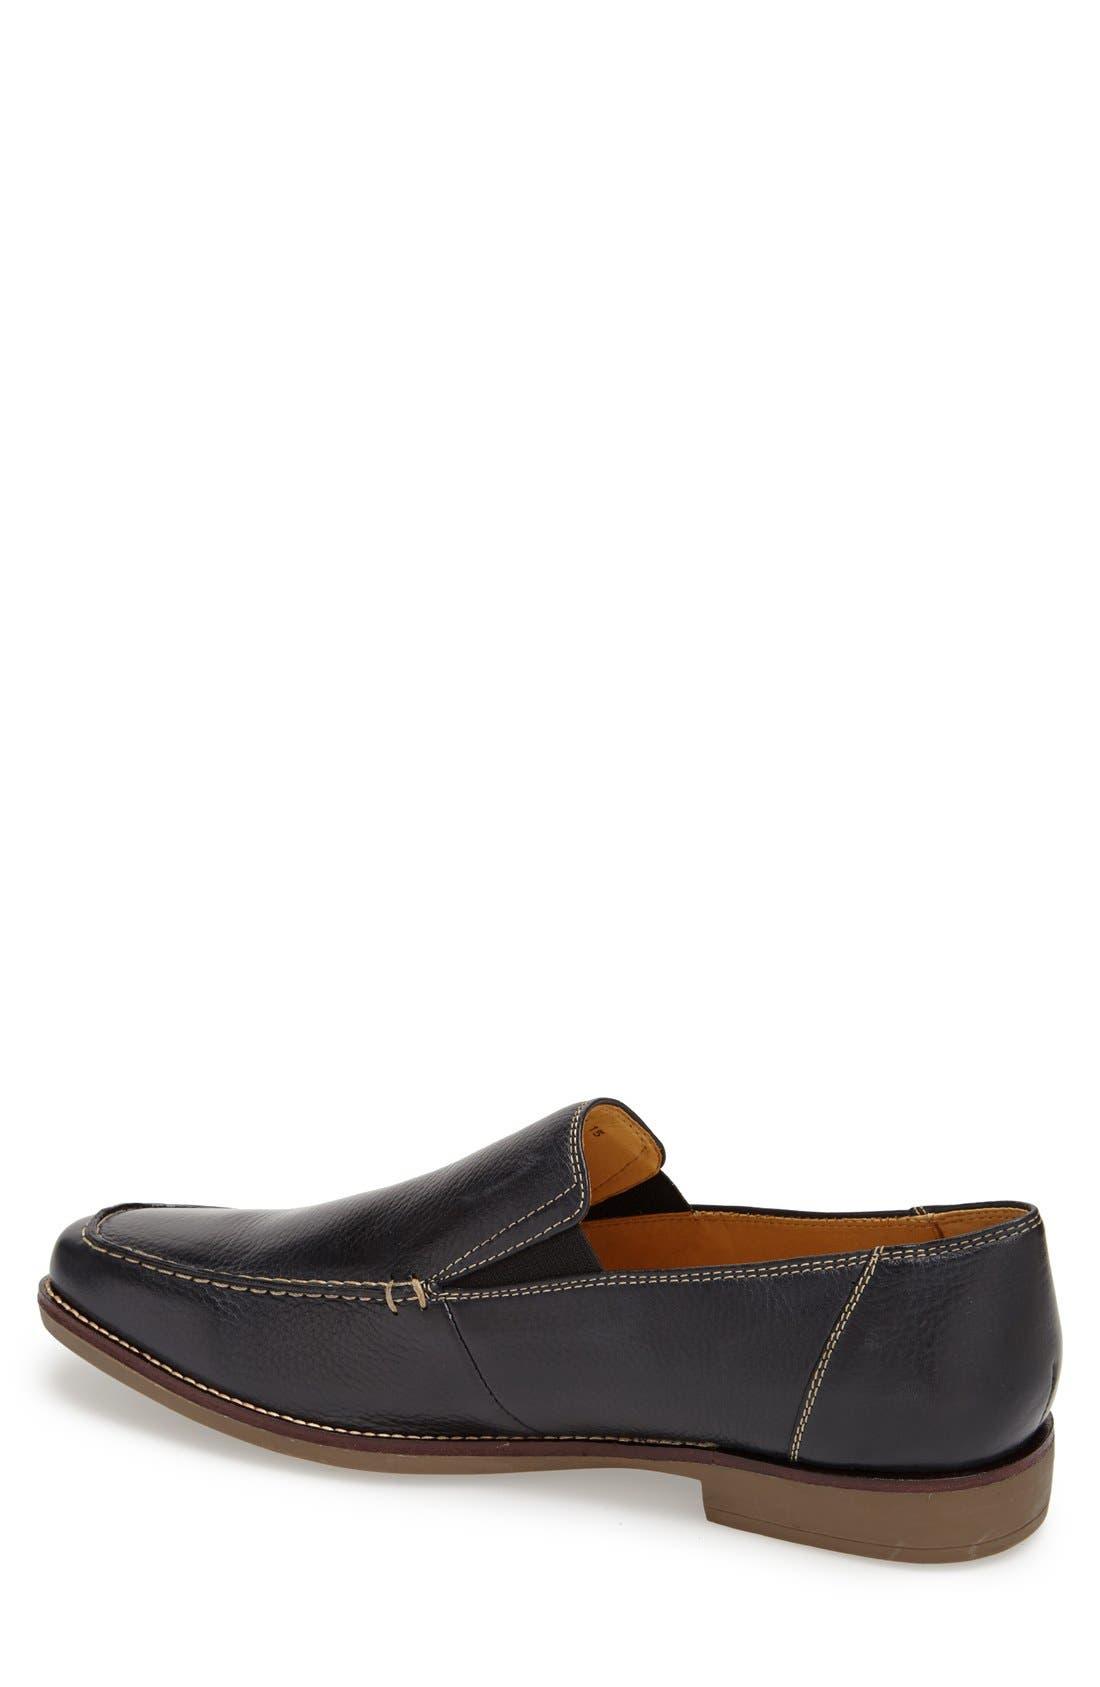 'Easy' Leather Venetian Loafer,                             Alternate thumbnail 2, color,                             NAVY